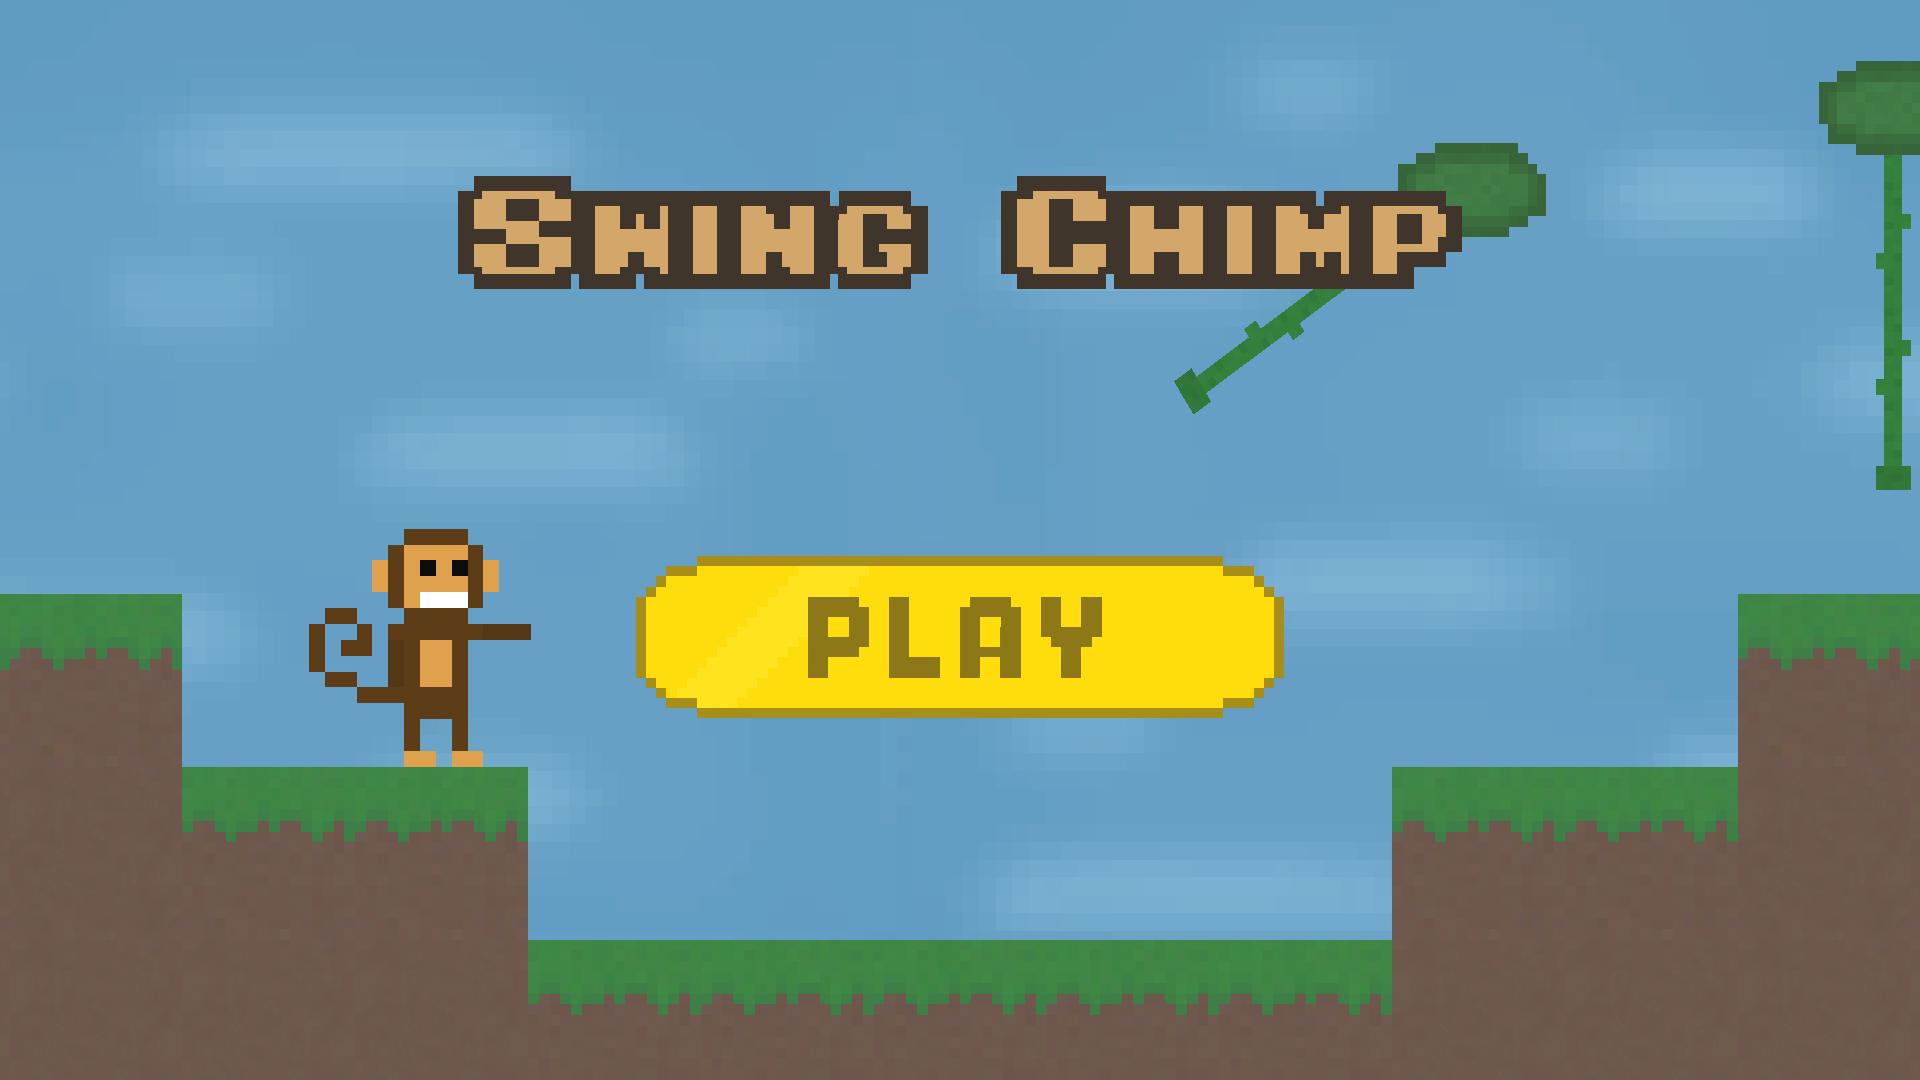 Swing Chimp